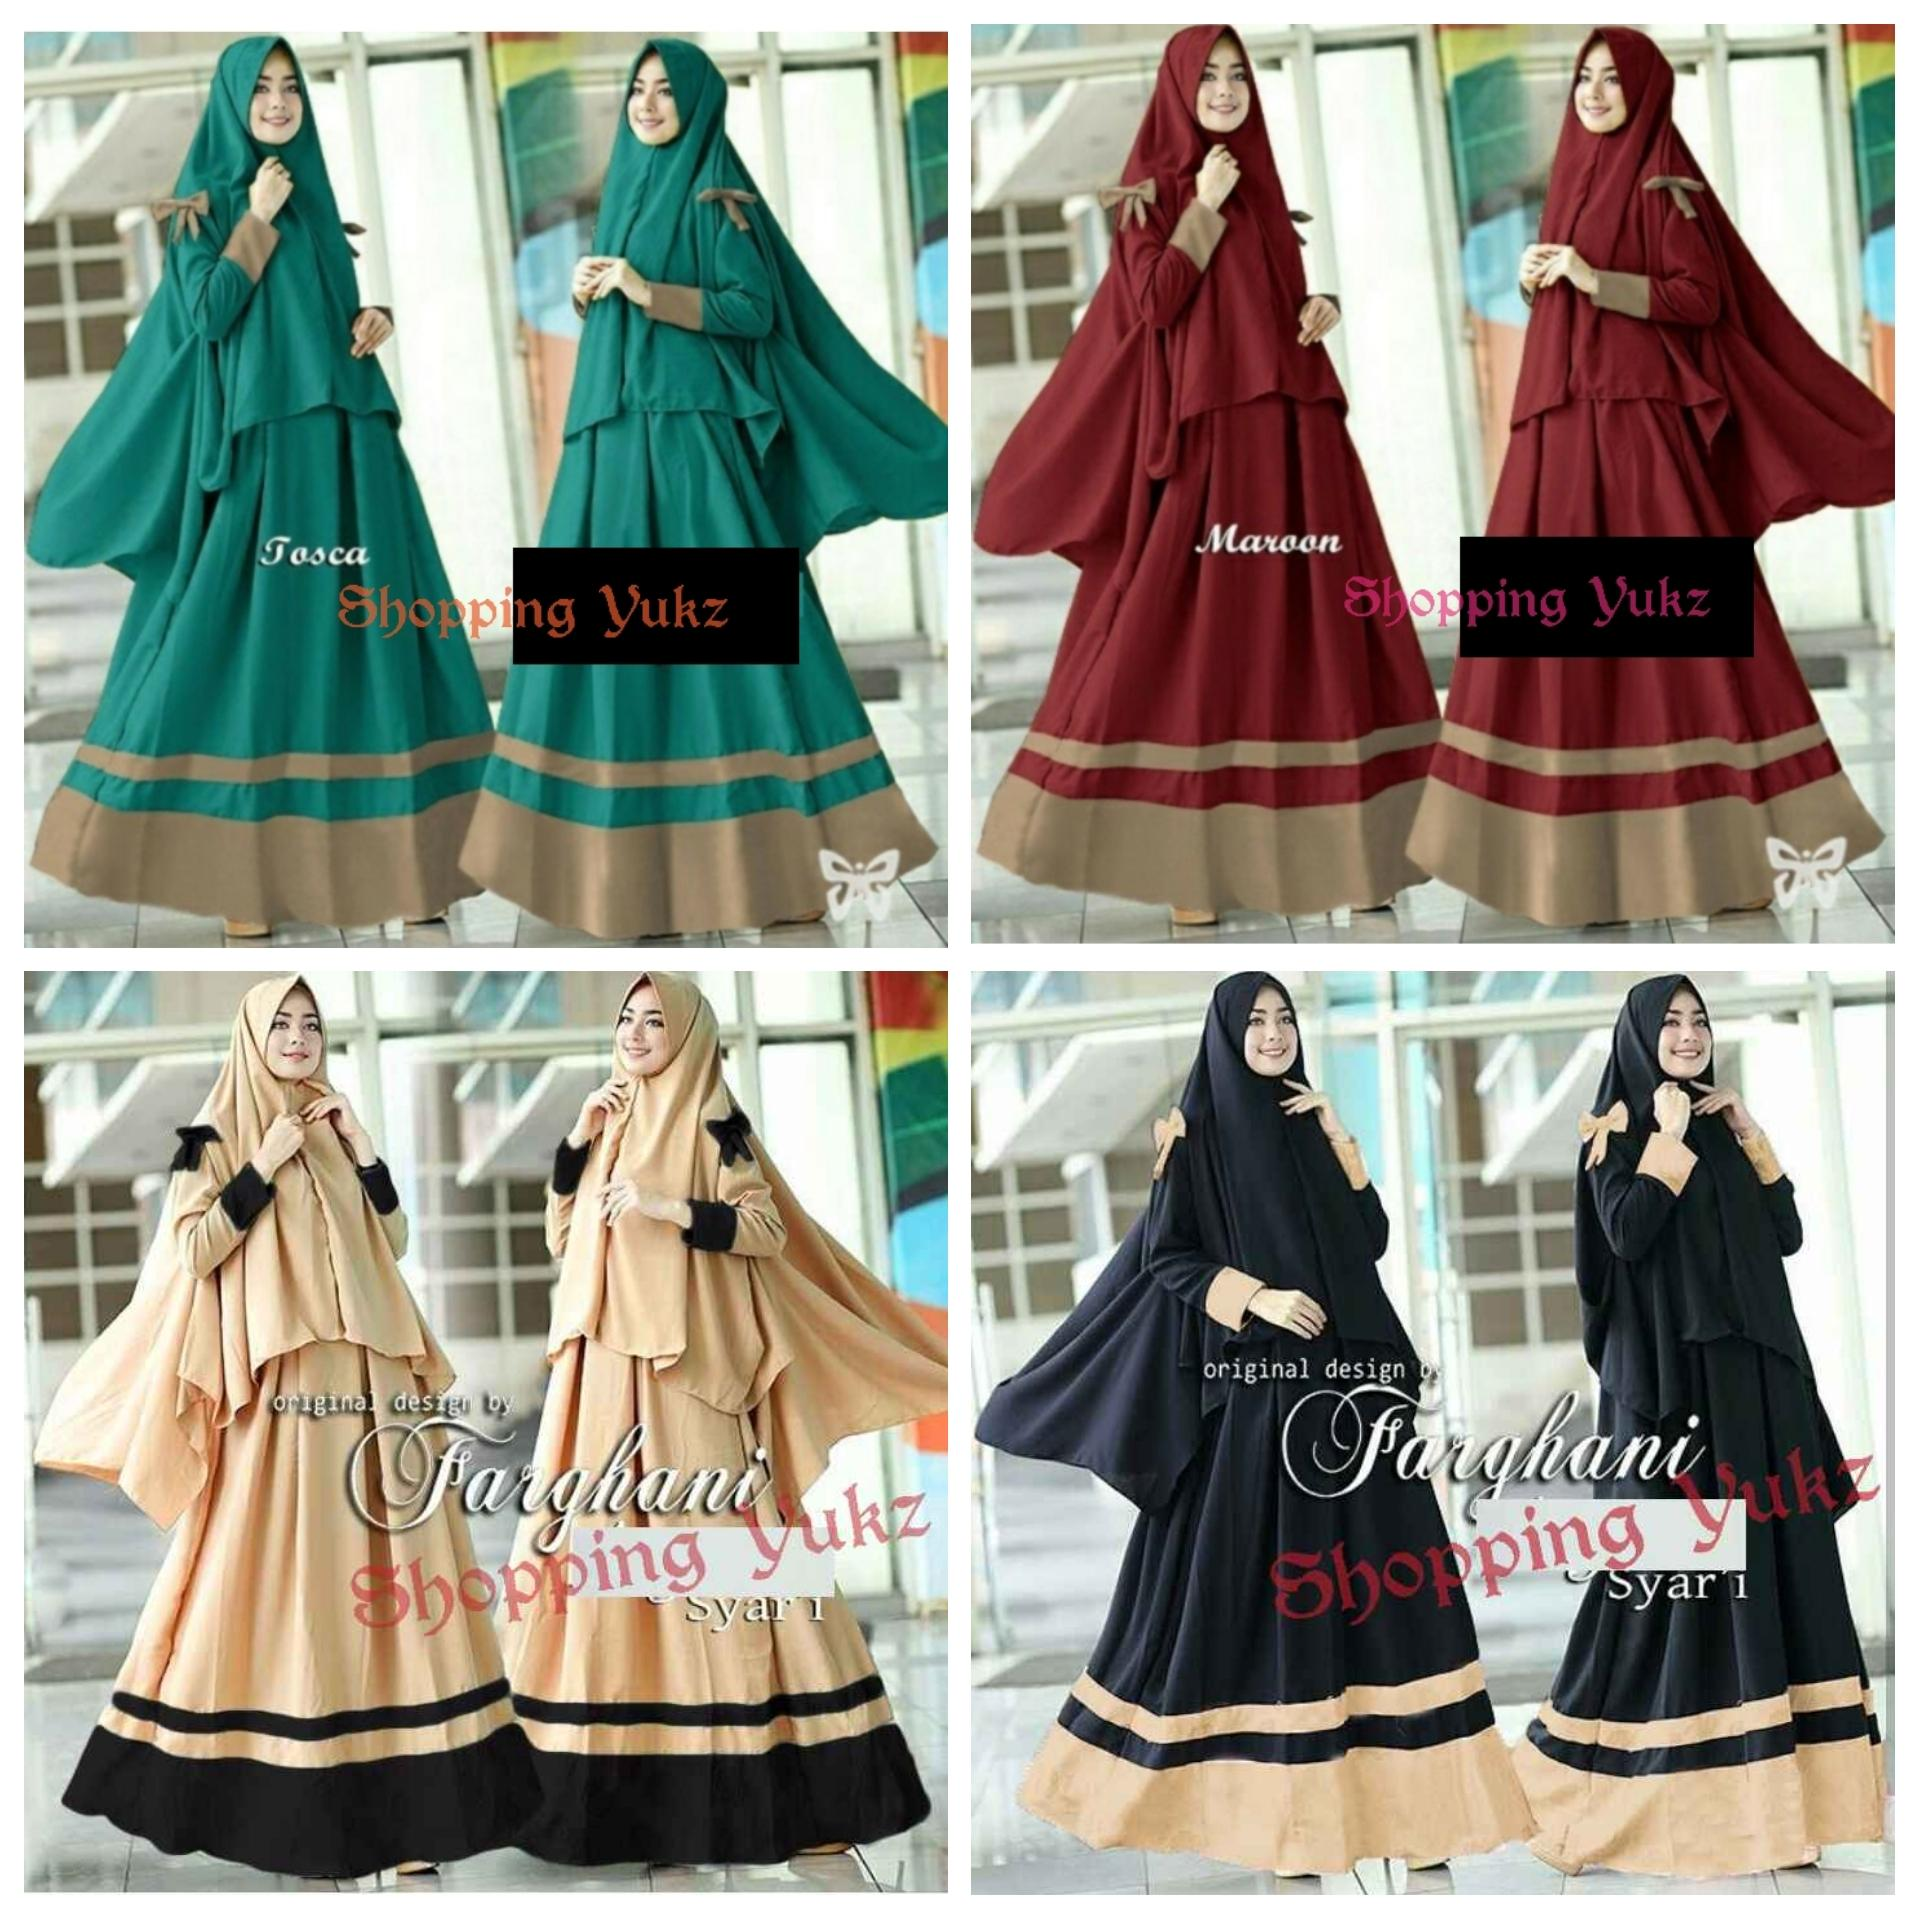 Shopping Yukz Baju Gamis Maxi Dress Muslim Wanita Syari 2in1 AIRYA ( Dapat Jilbab ) / Dress Muslim / Gamis Wanita / Baju Muslim / Hijab Muslim / Fashion Muslim / Syar'i Muslim / Maxi Dress Lengan Panjang / Gamis Modern